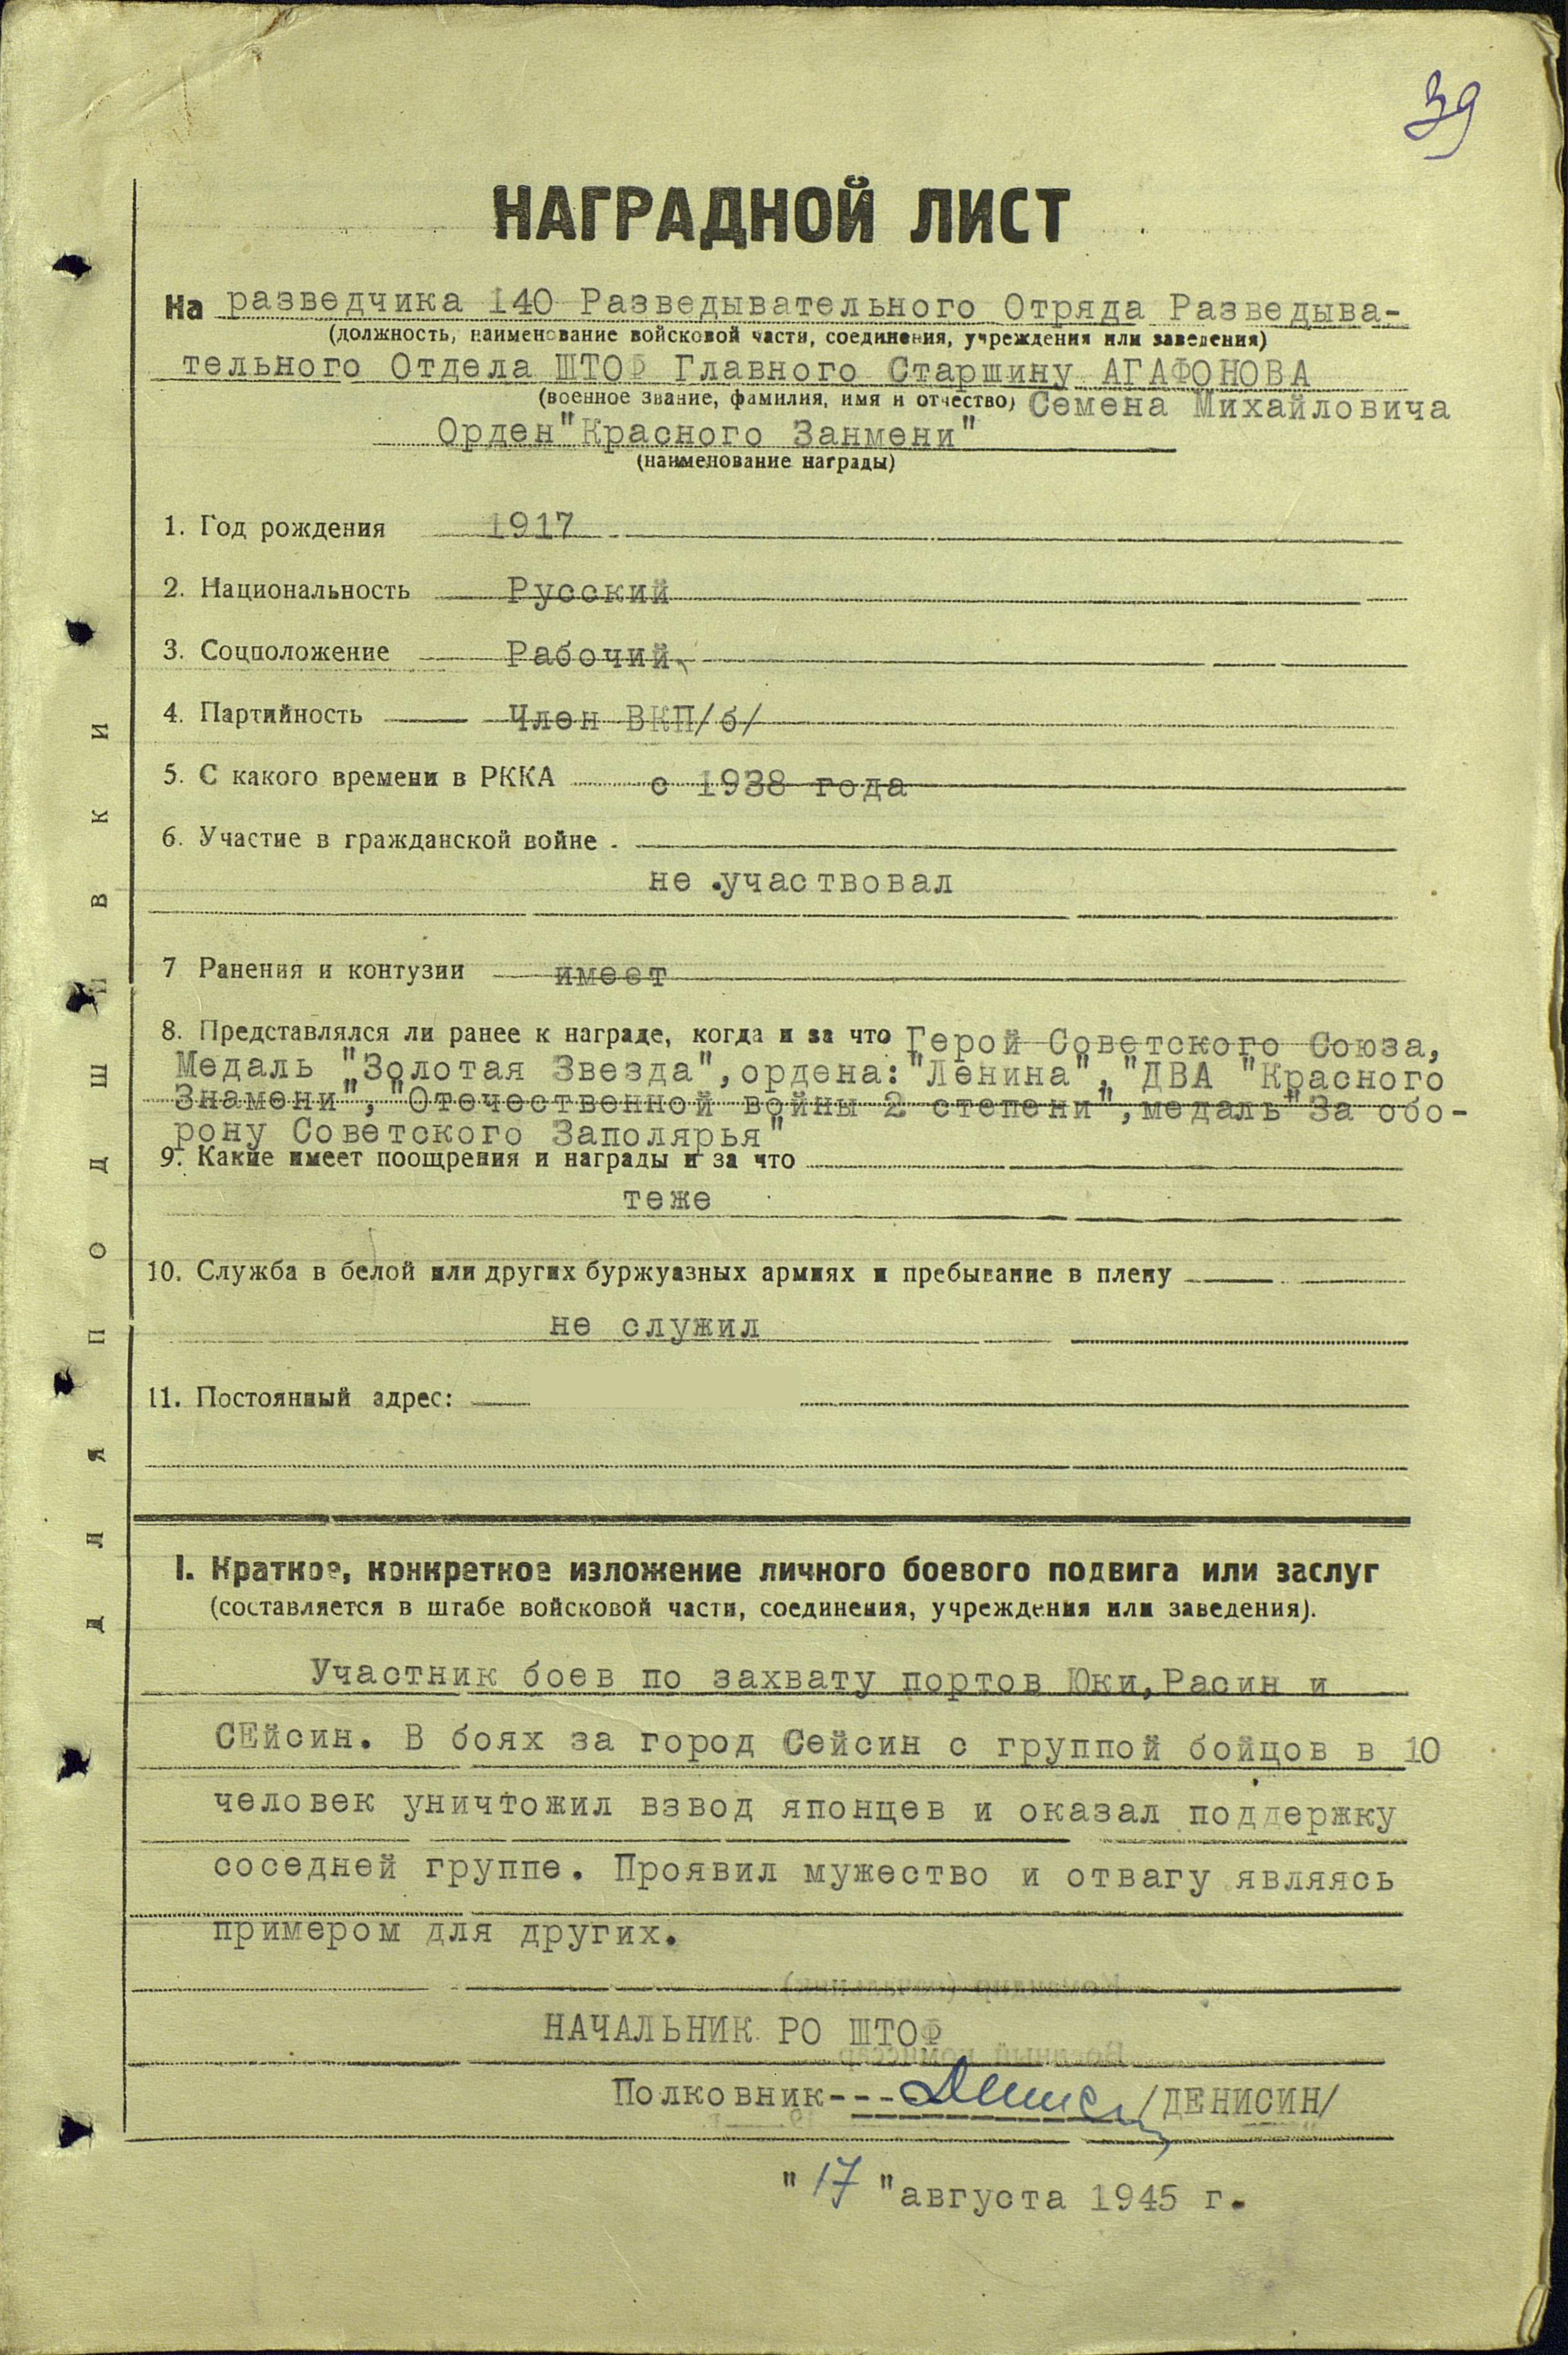 Агафонов БКЗ 5